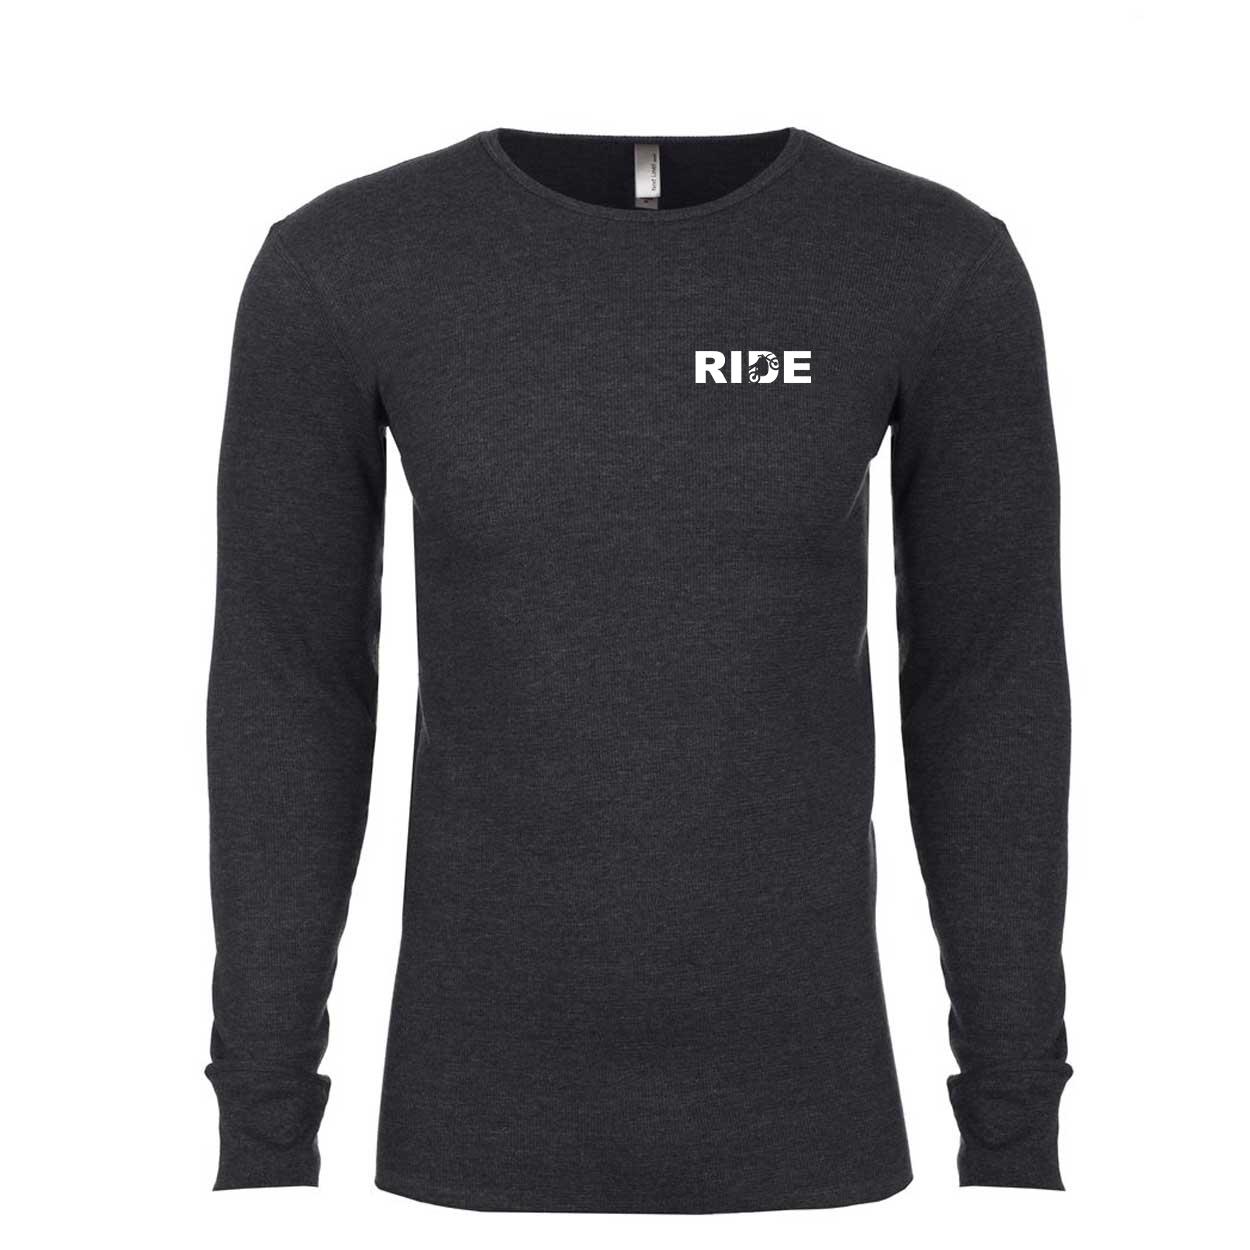 Ride Moto Logo Long Sleeve Thermal Shirt Heather Charcoal (White Logo)